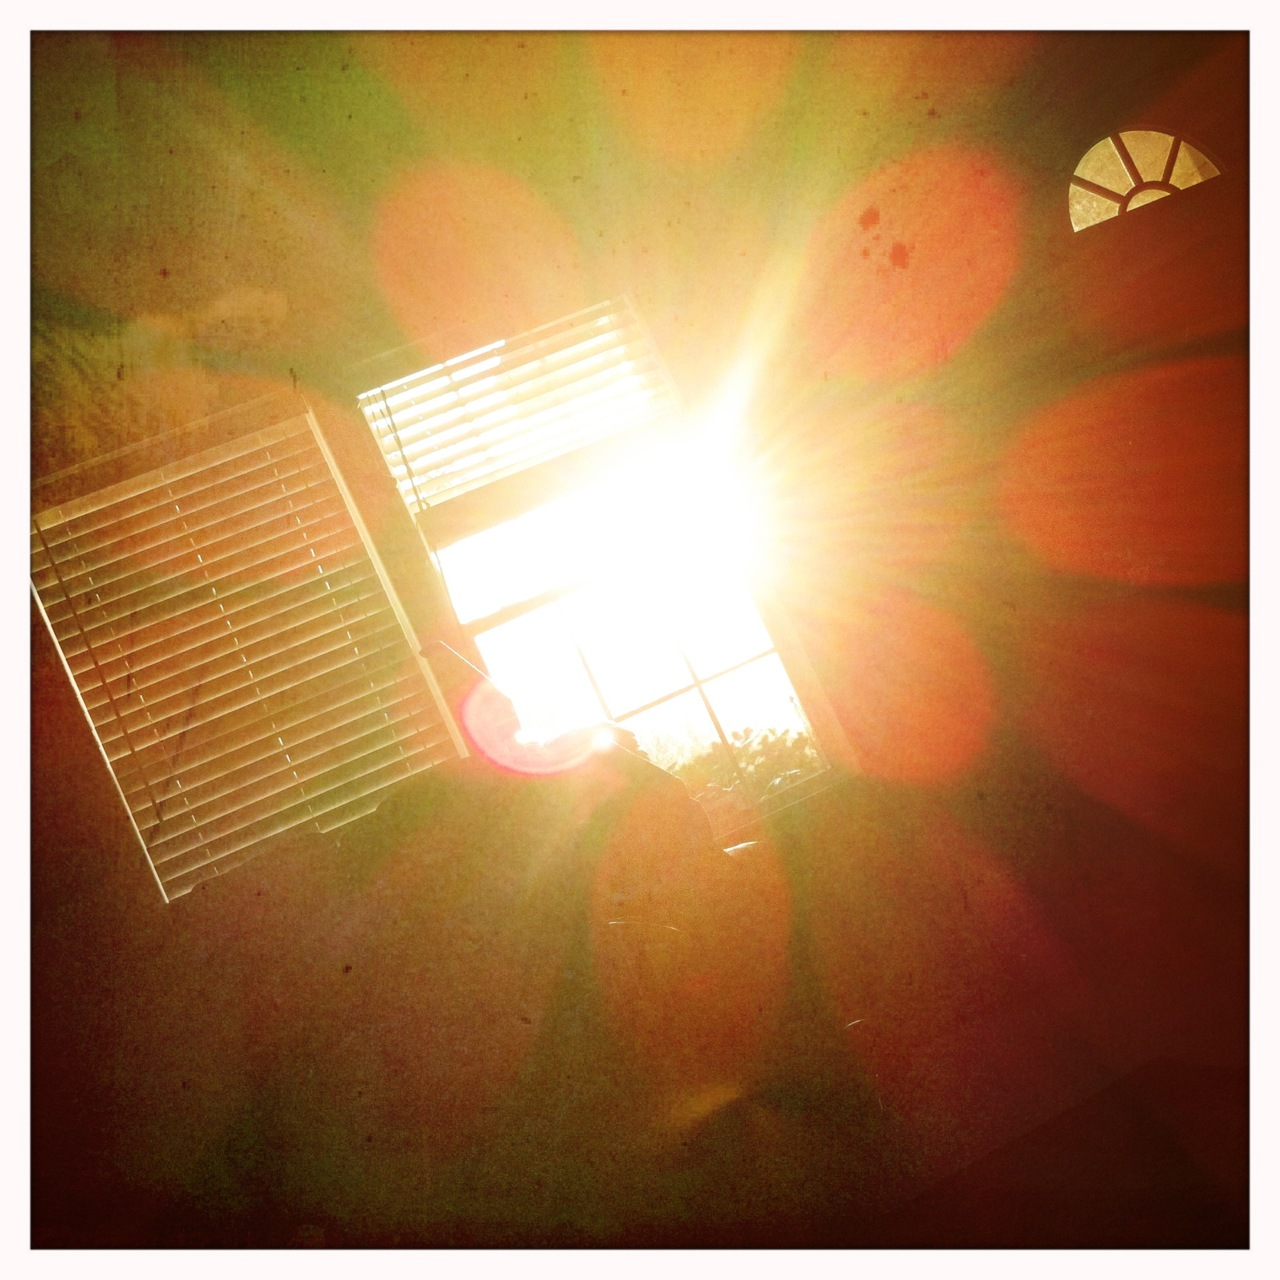 Morning window sun 6 Buckhorst H1 Lens, Blanko Film, No Flash,